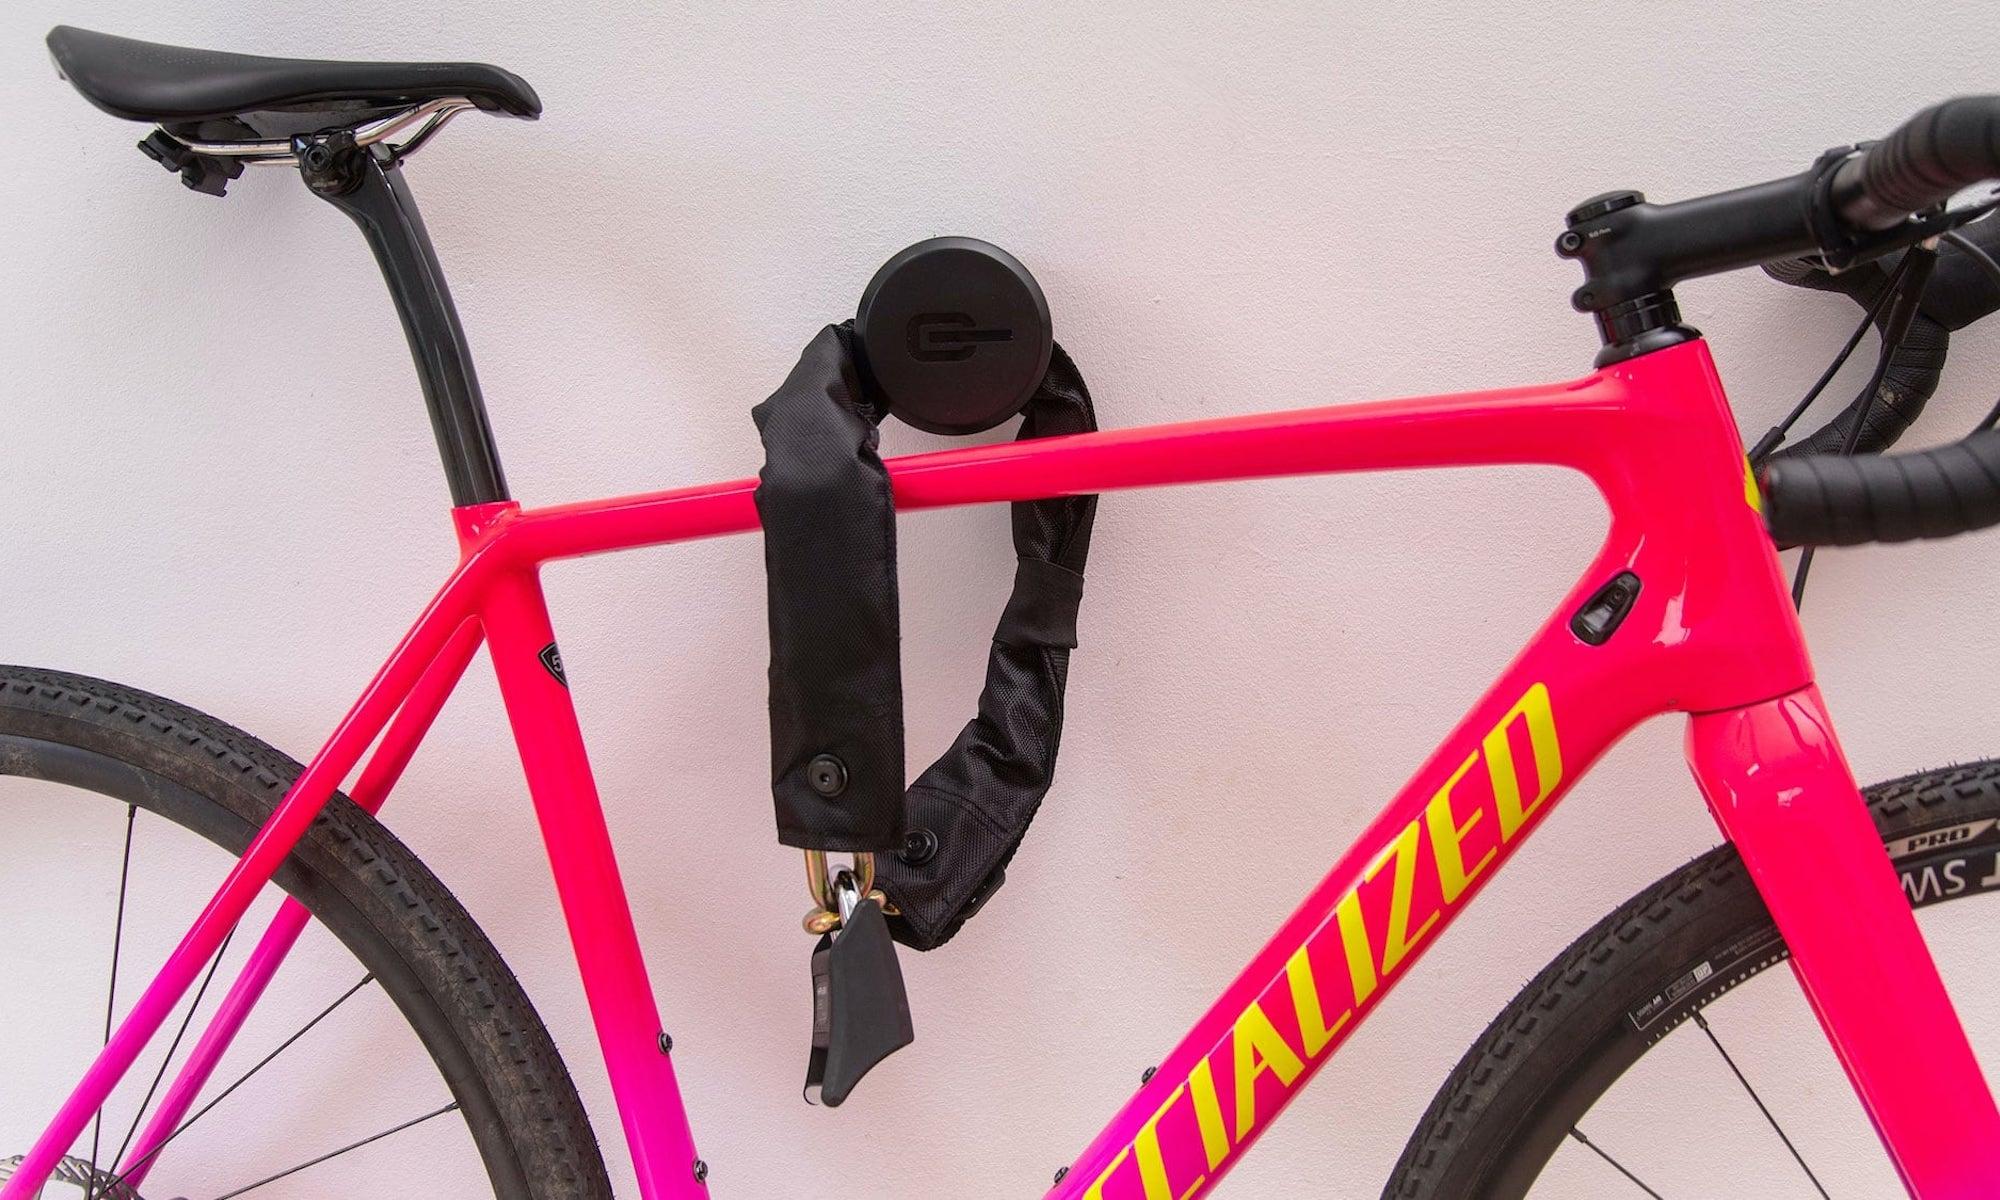 Hiplok ANKR Maximum Security Bicycle Anchor